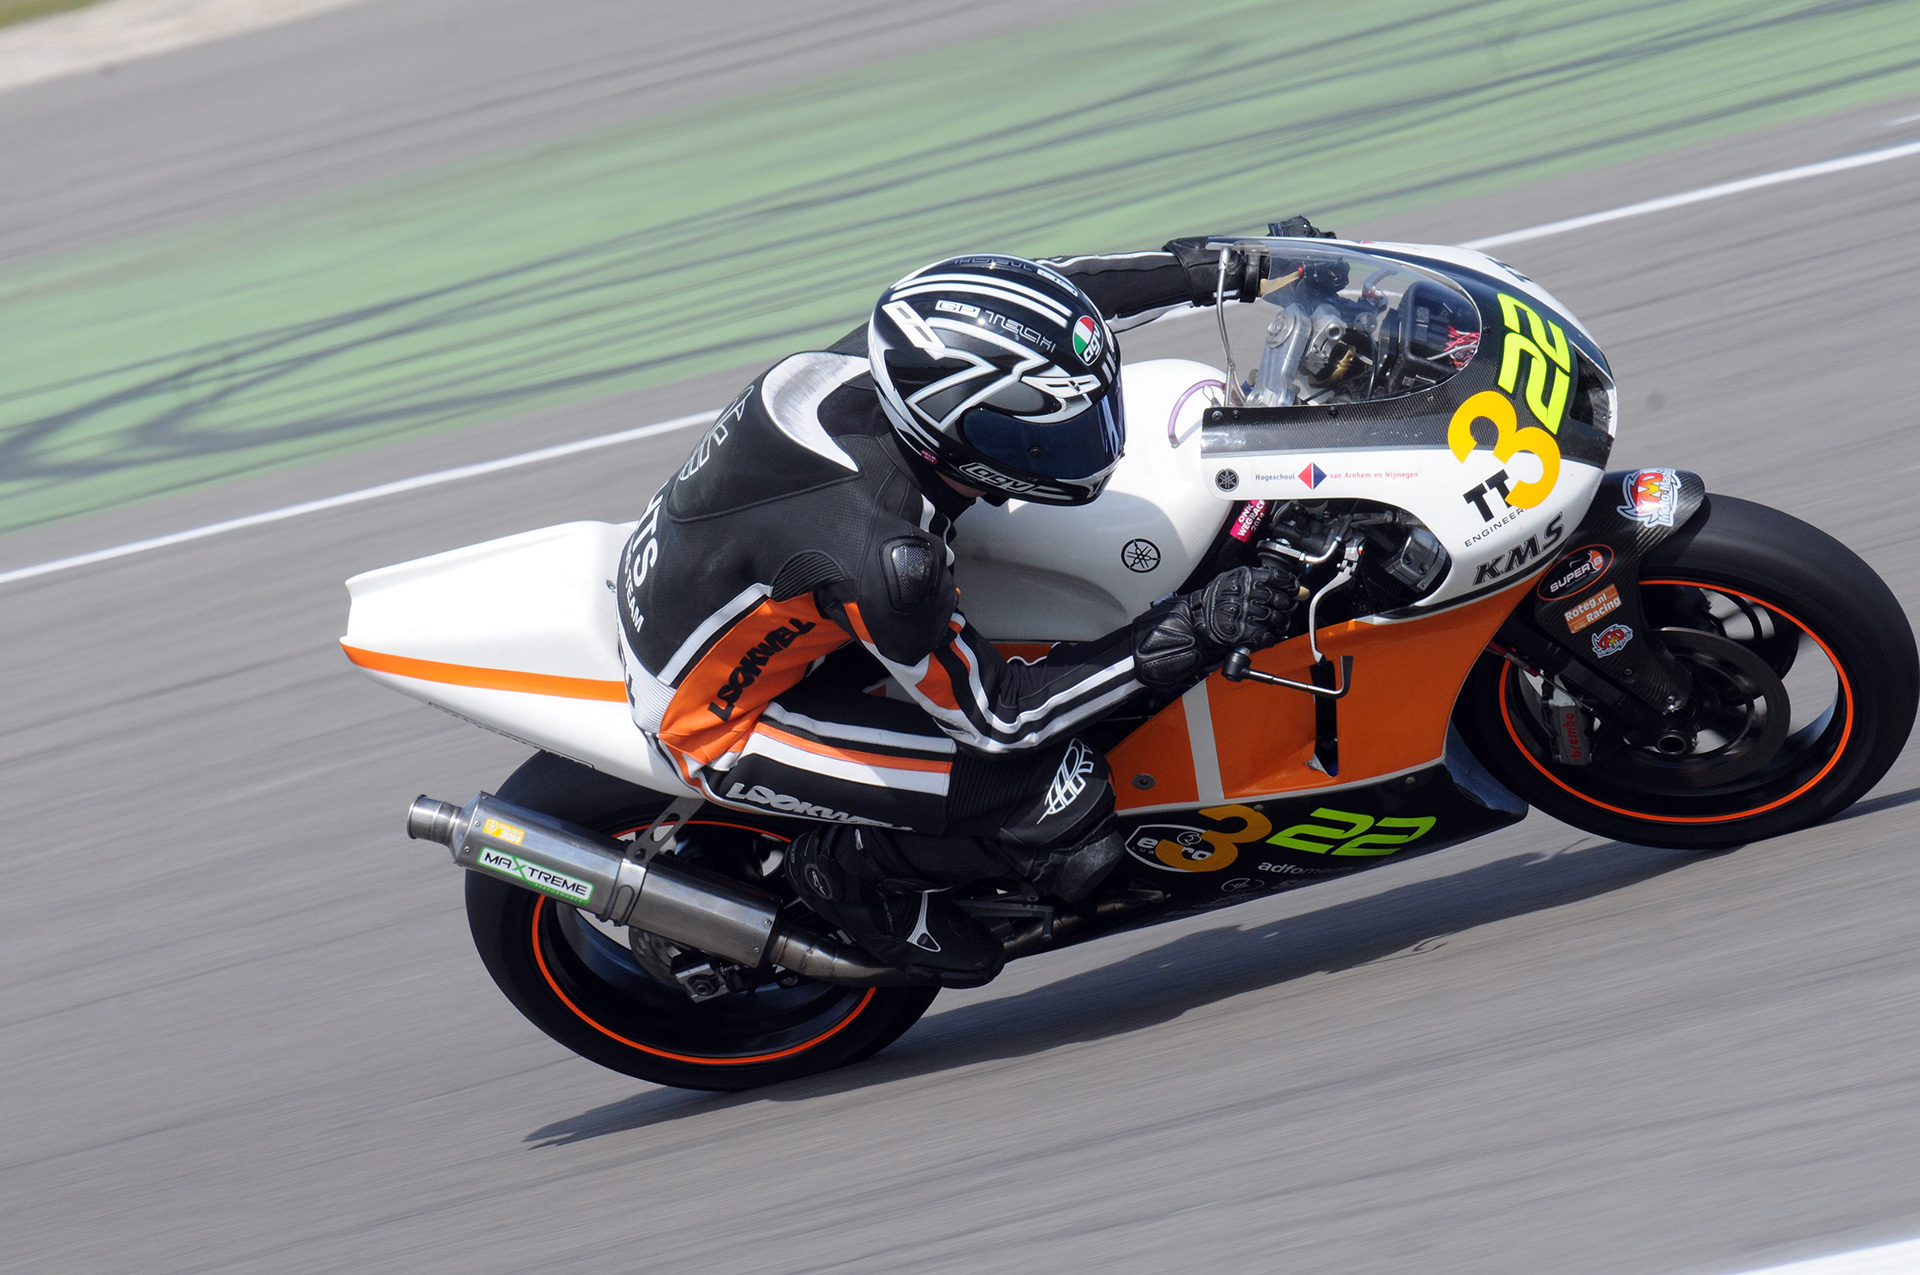 hts-racing-team